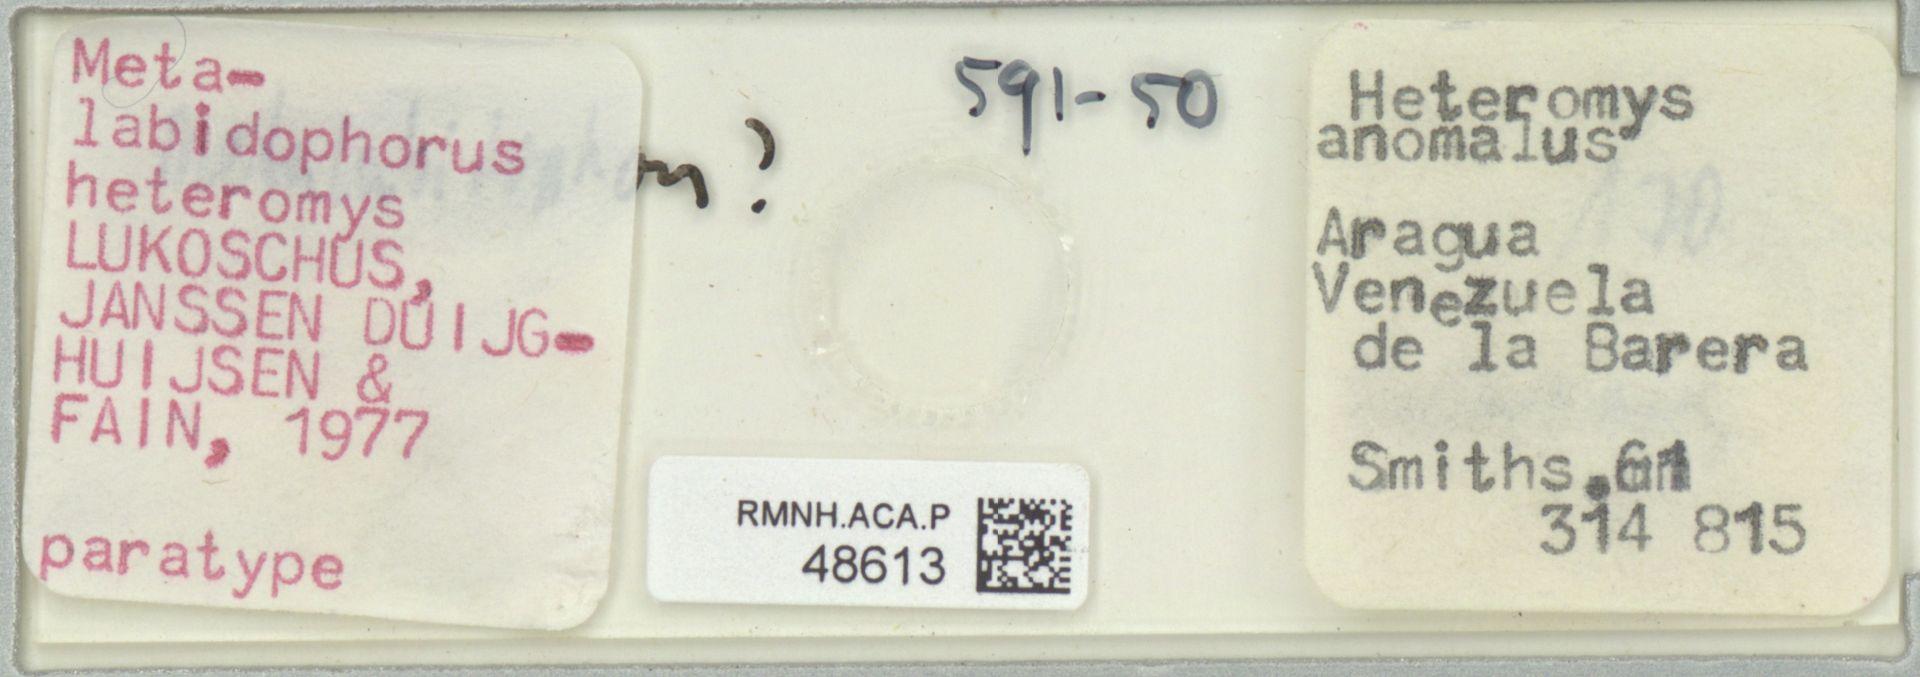 RMNH.ACA.P.48613 | Metalabidophorus heteromys Lukoschus, Janssen Duijghuijsen & Fain, 1977